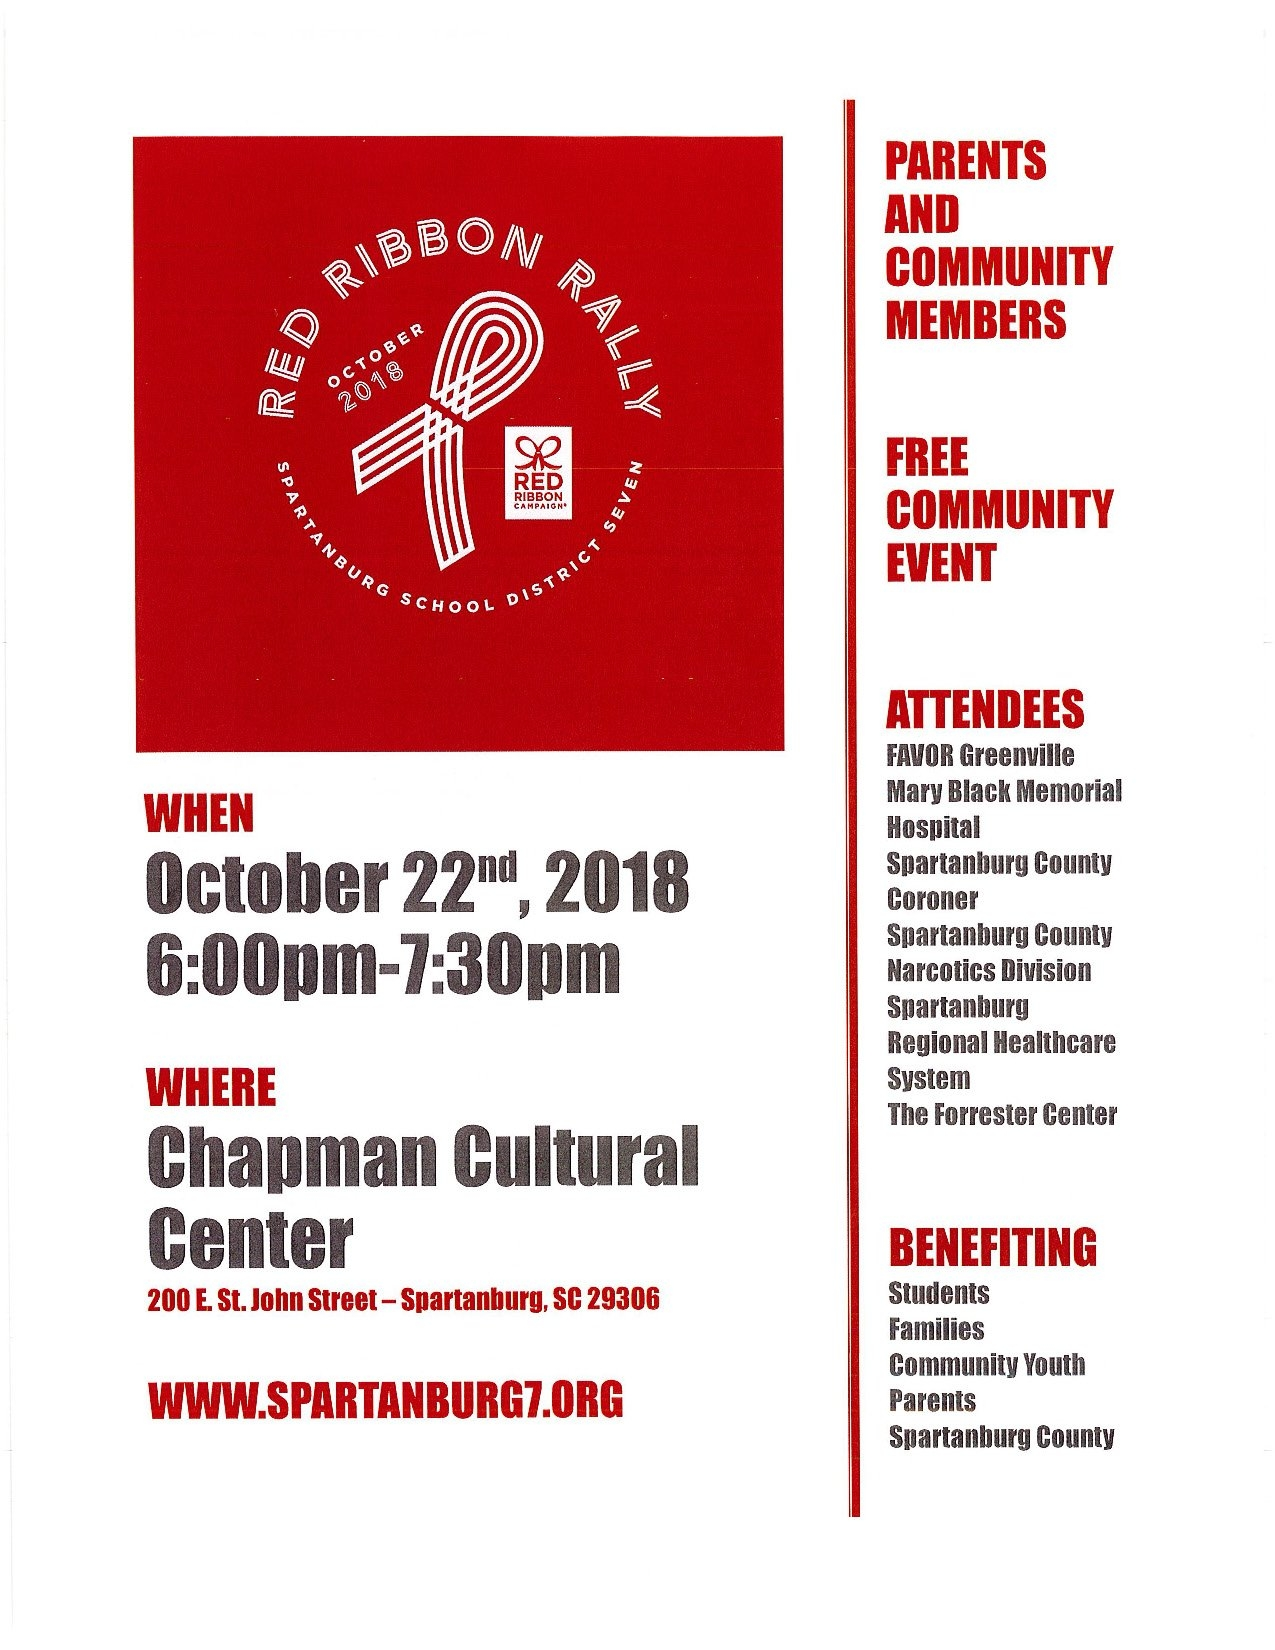 Red Ribbon Rally   Spartanburg 7 :: Chapman Cultural Center Spartanburg District 7 Calendar 2019